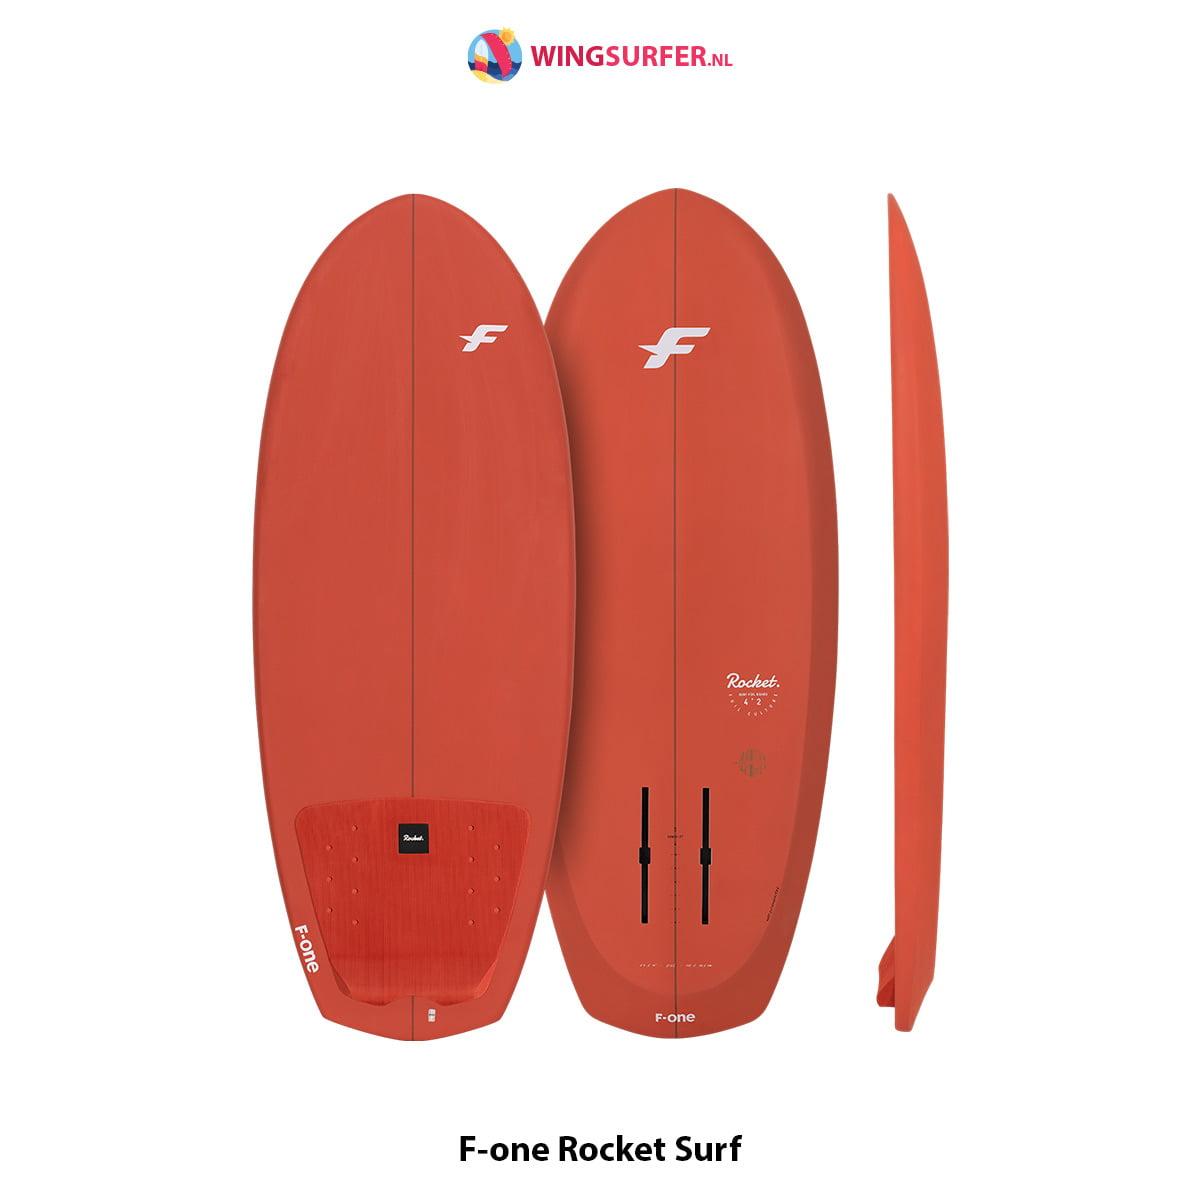 F-one Rocket Surf